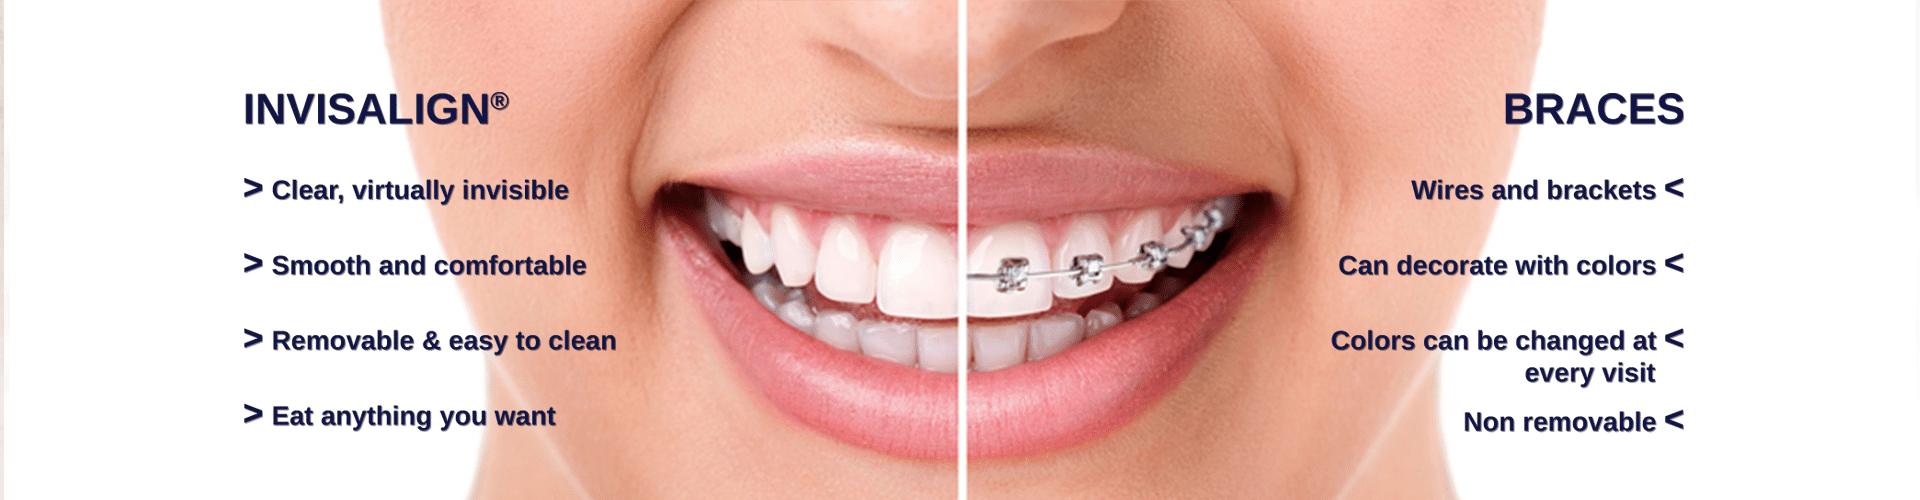 Orthodontist baton rouge la invisalign braces porter orthodontics invisalign slider at porter orthodontics baton rouge la solutioingenieria Images